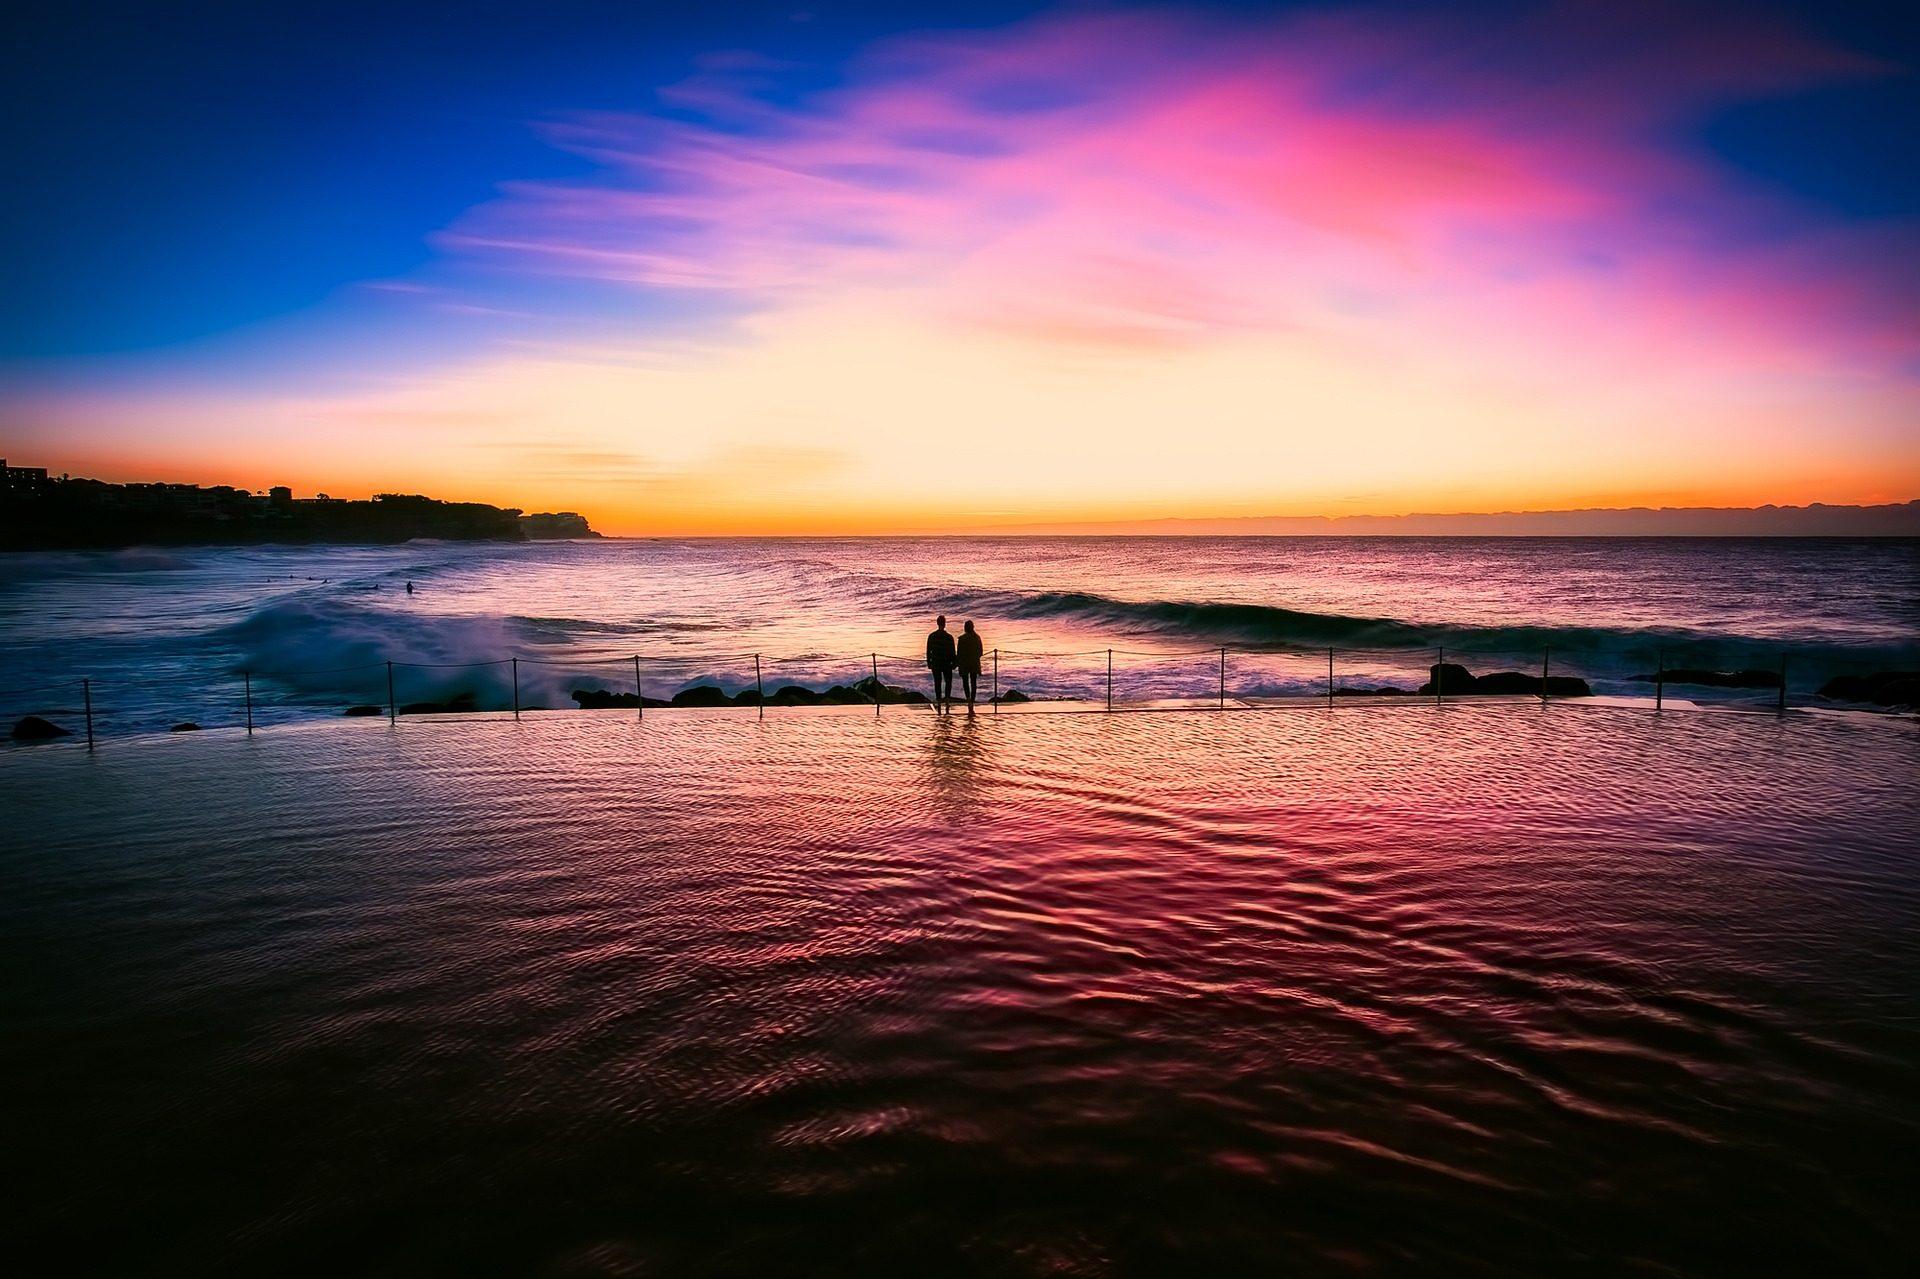 mar, 海, サンセット, カップル, シルエット - HD の壁紙 - 教授-falken.com